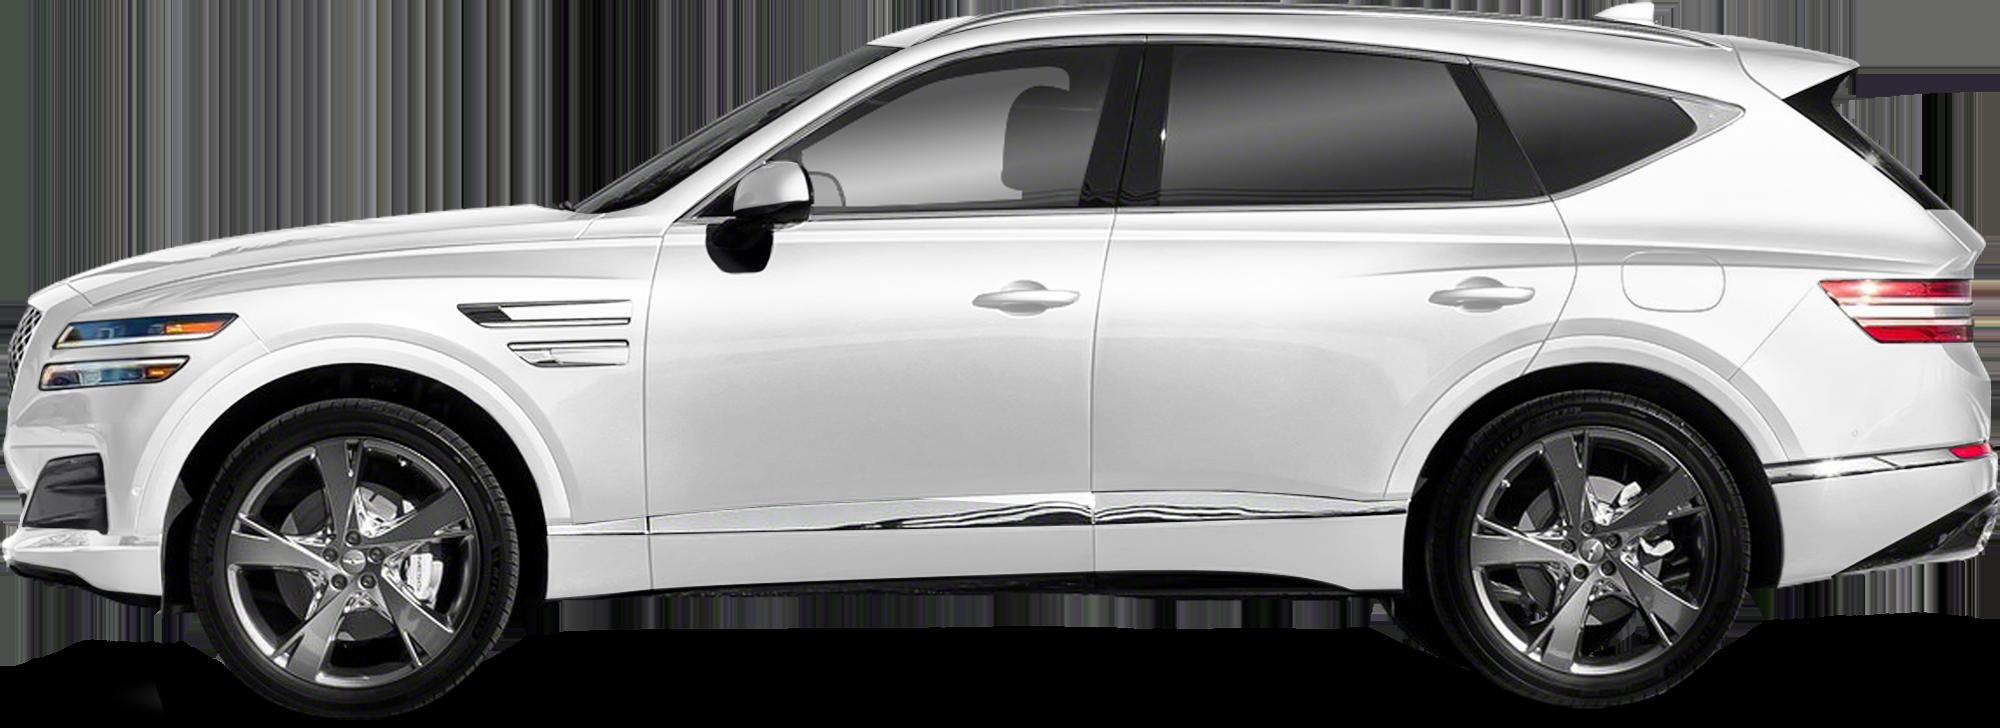 2021 Genesis GV80 SUV 2.5T RWD